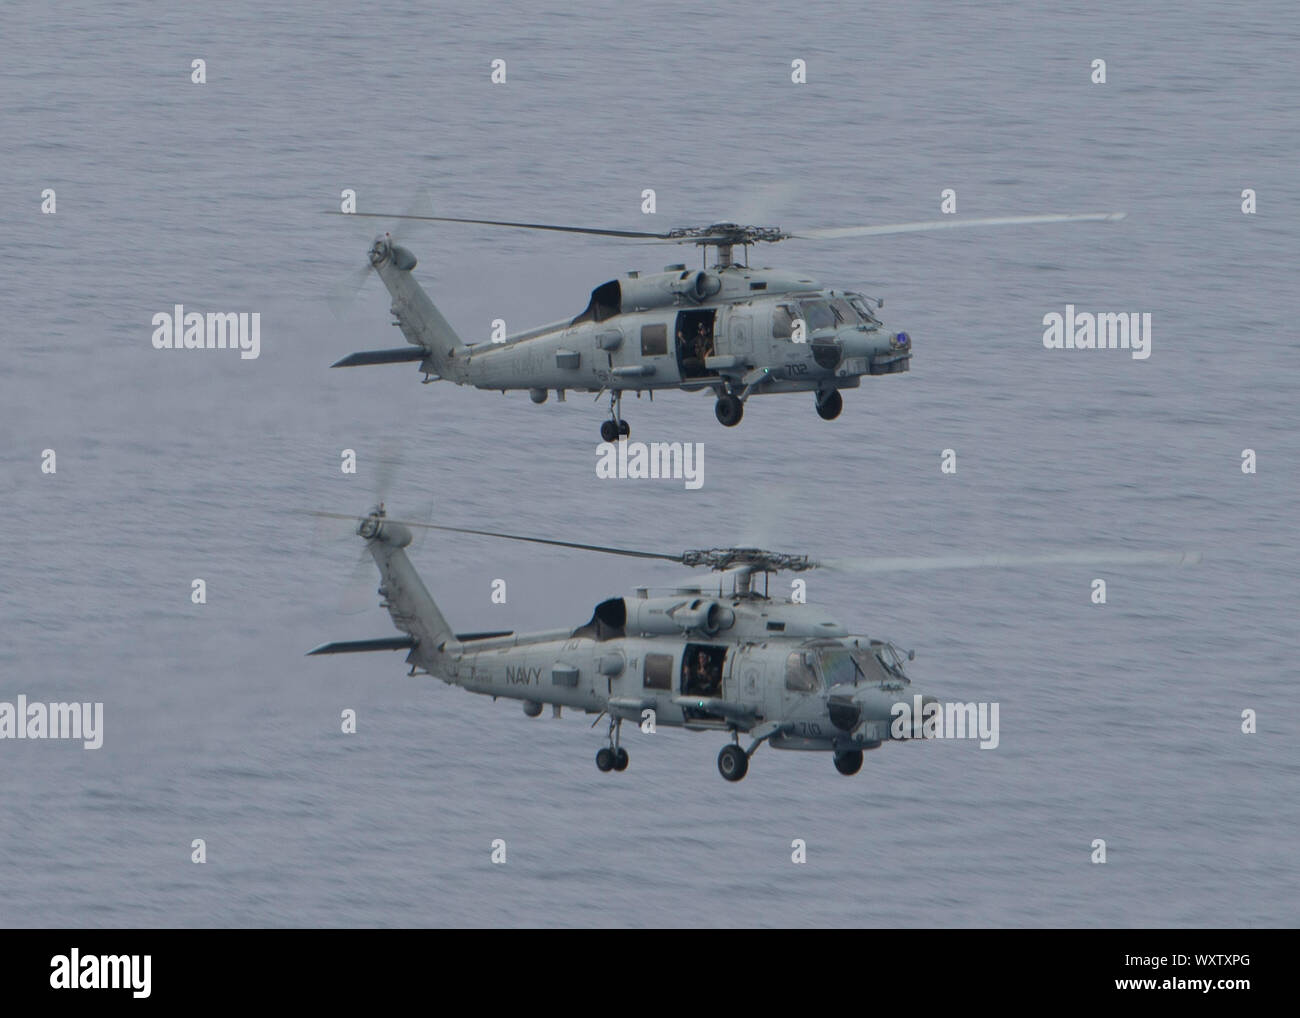 72 Squadron Stock Photos & 72 Squadron Stock Images - Alamy